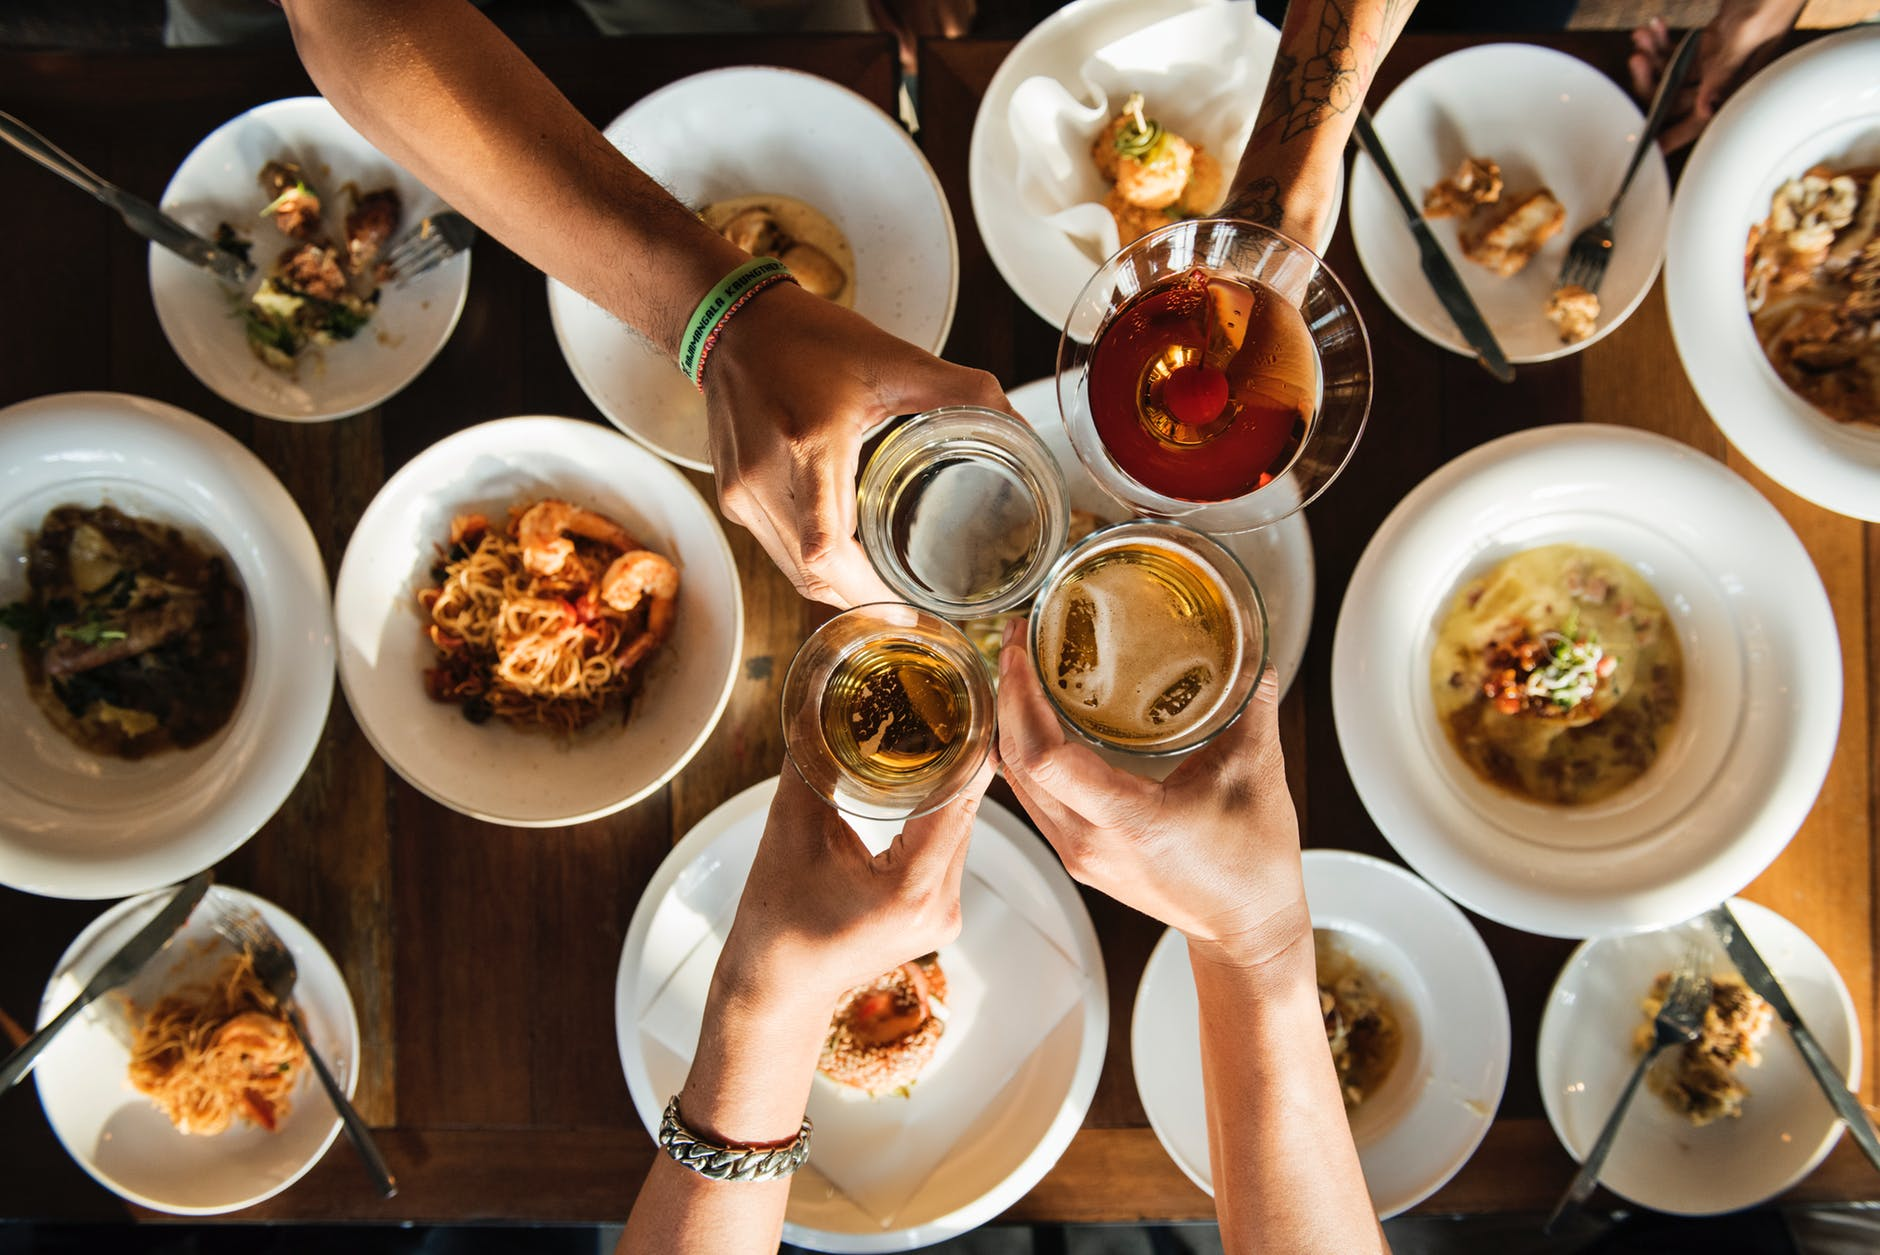 Restaurant et gastronomie